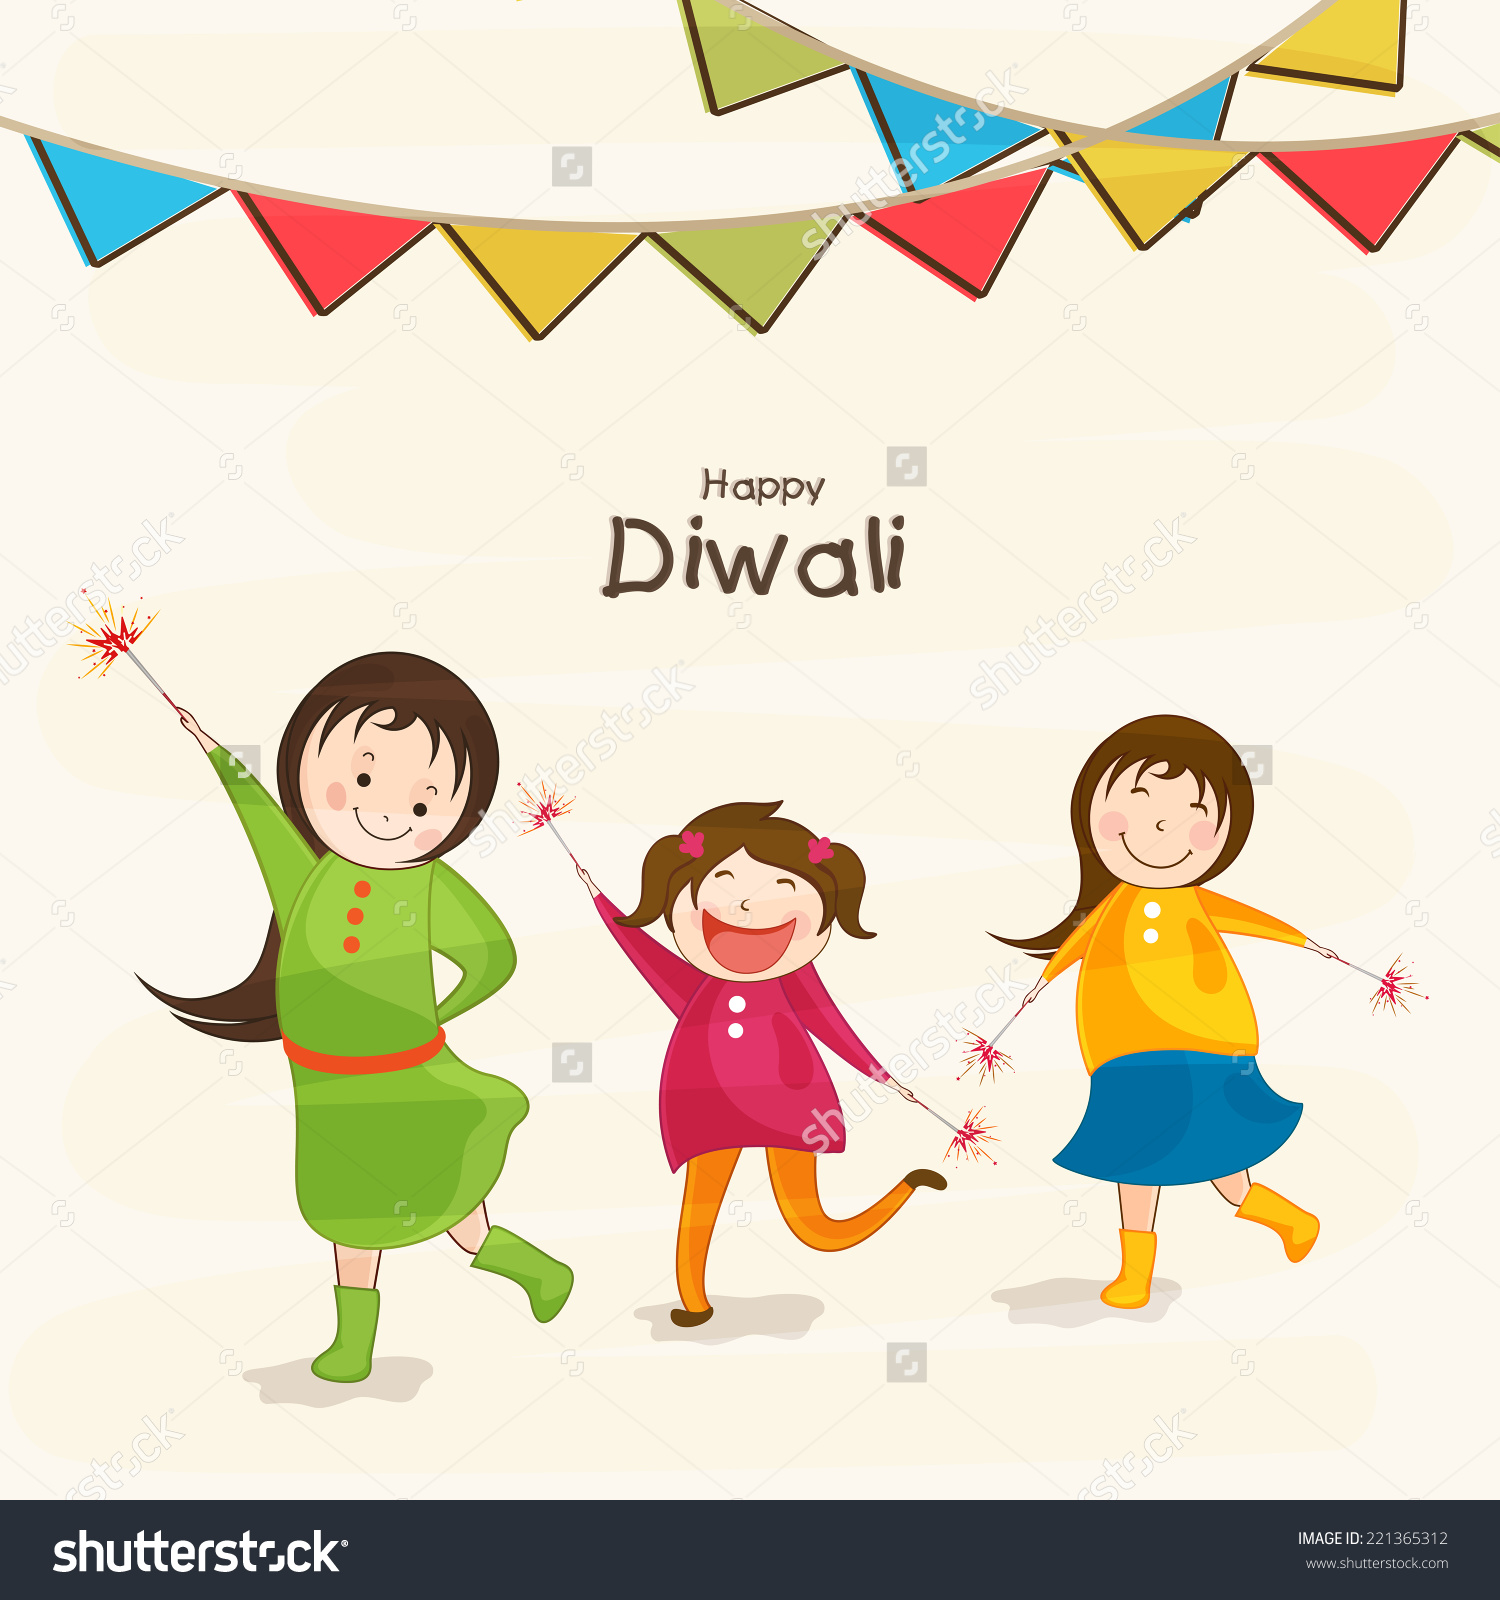 Celebration clipart cute. Diwali kids station